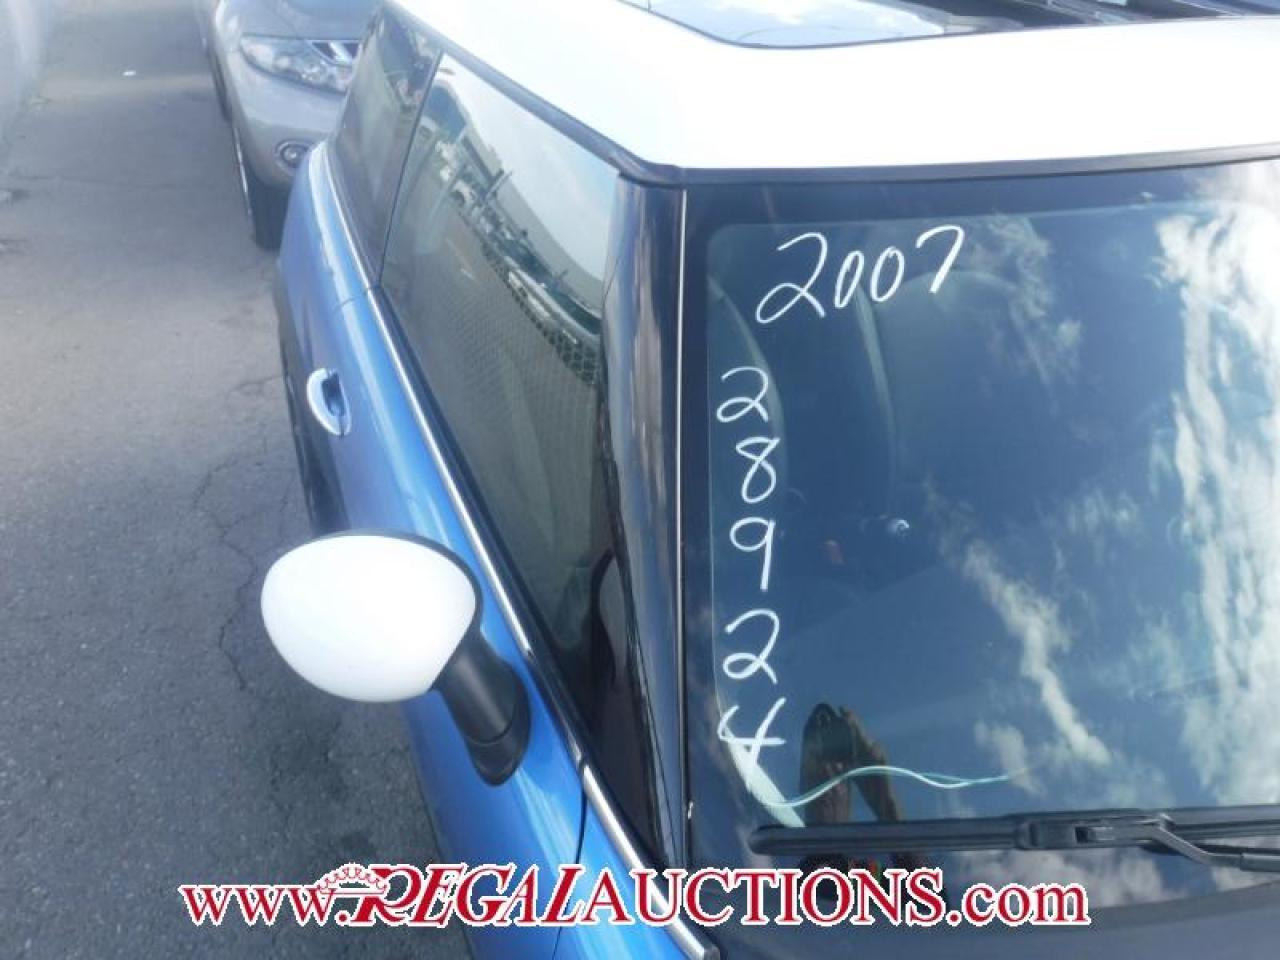 2007 MINI COOPER S 2D HATCHBACK